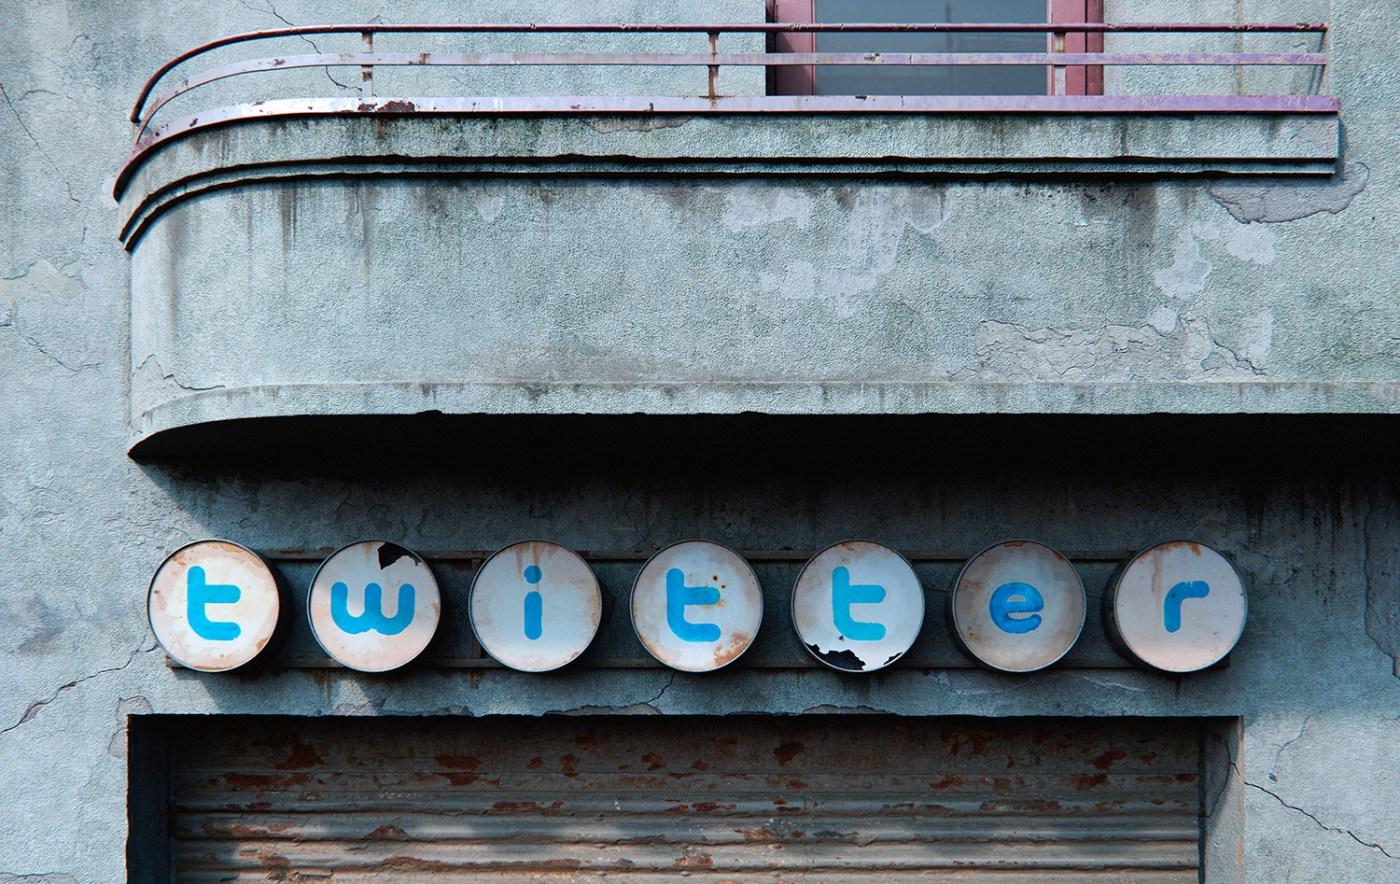 AndreiLacatusu social decay lettres logo enseigne typographie urbain urbex twitter - Social decay : les logos de Twitter, Facebook et Tinder transformés en enseignes vintage